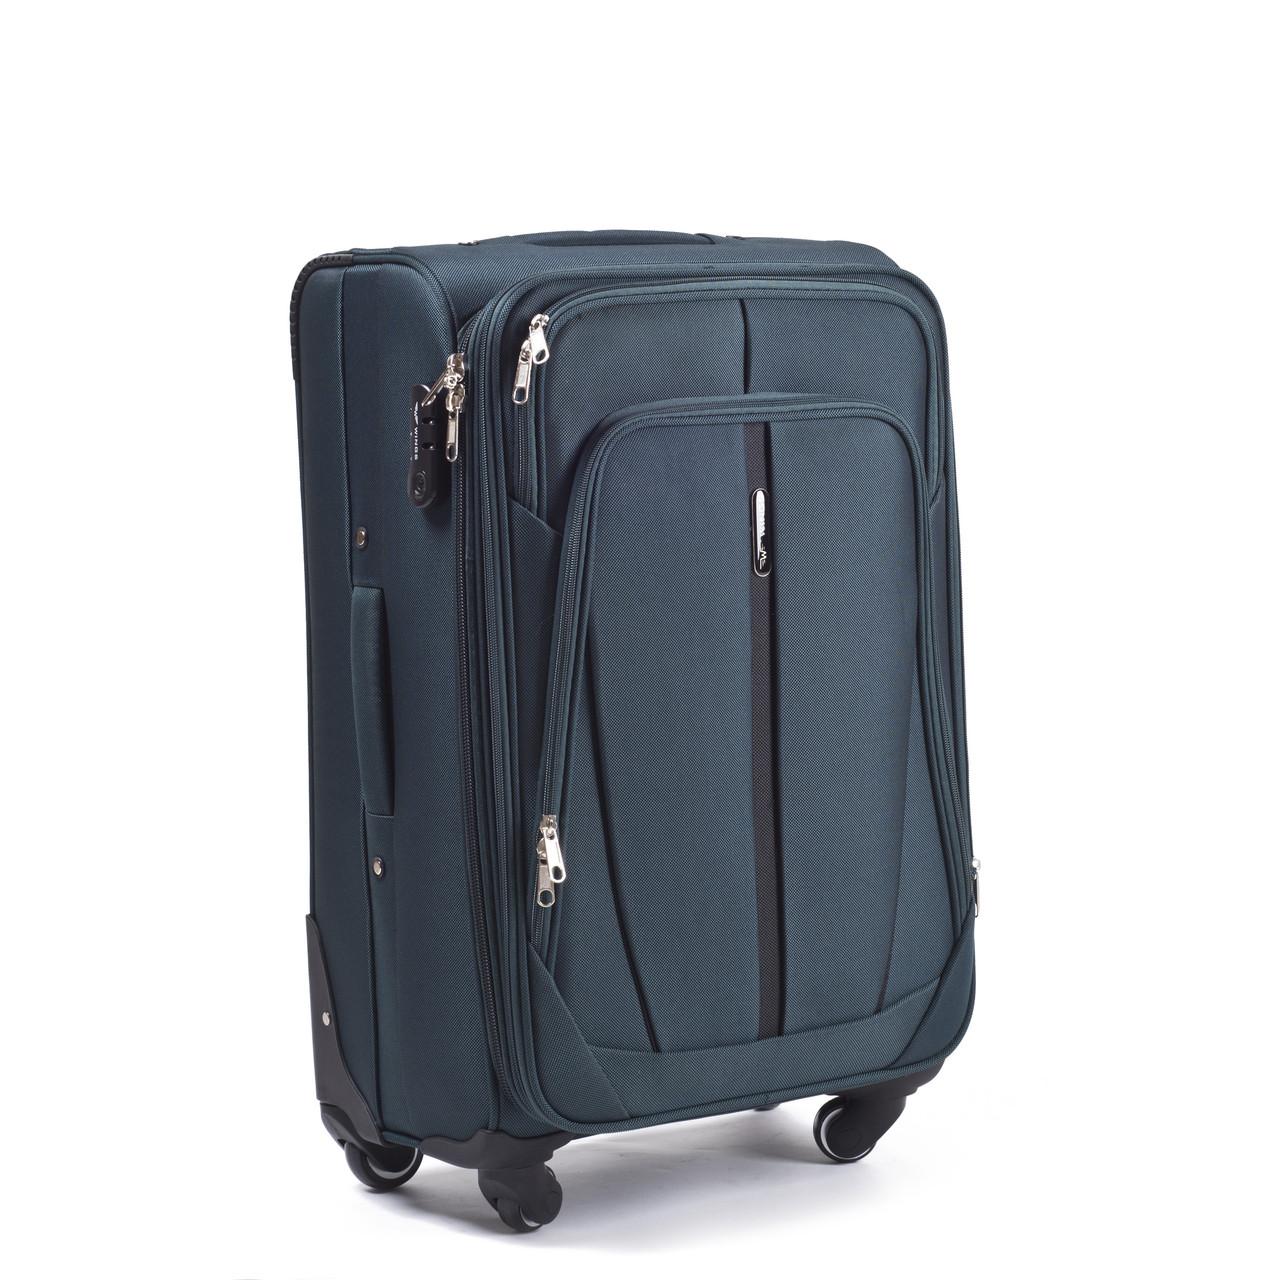 Средний тканевый чемодан Wings 1706 на 4 колесах зеленый